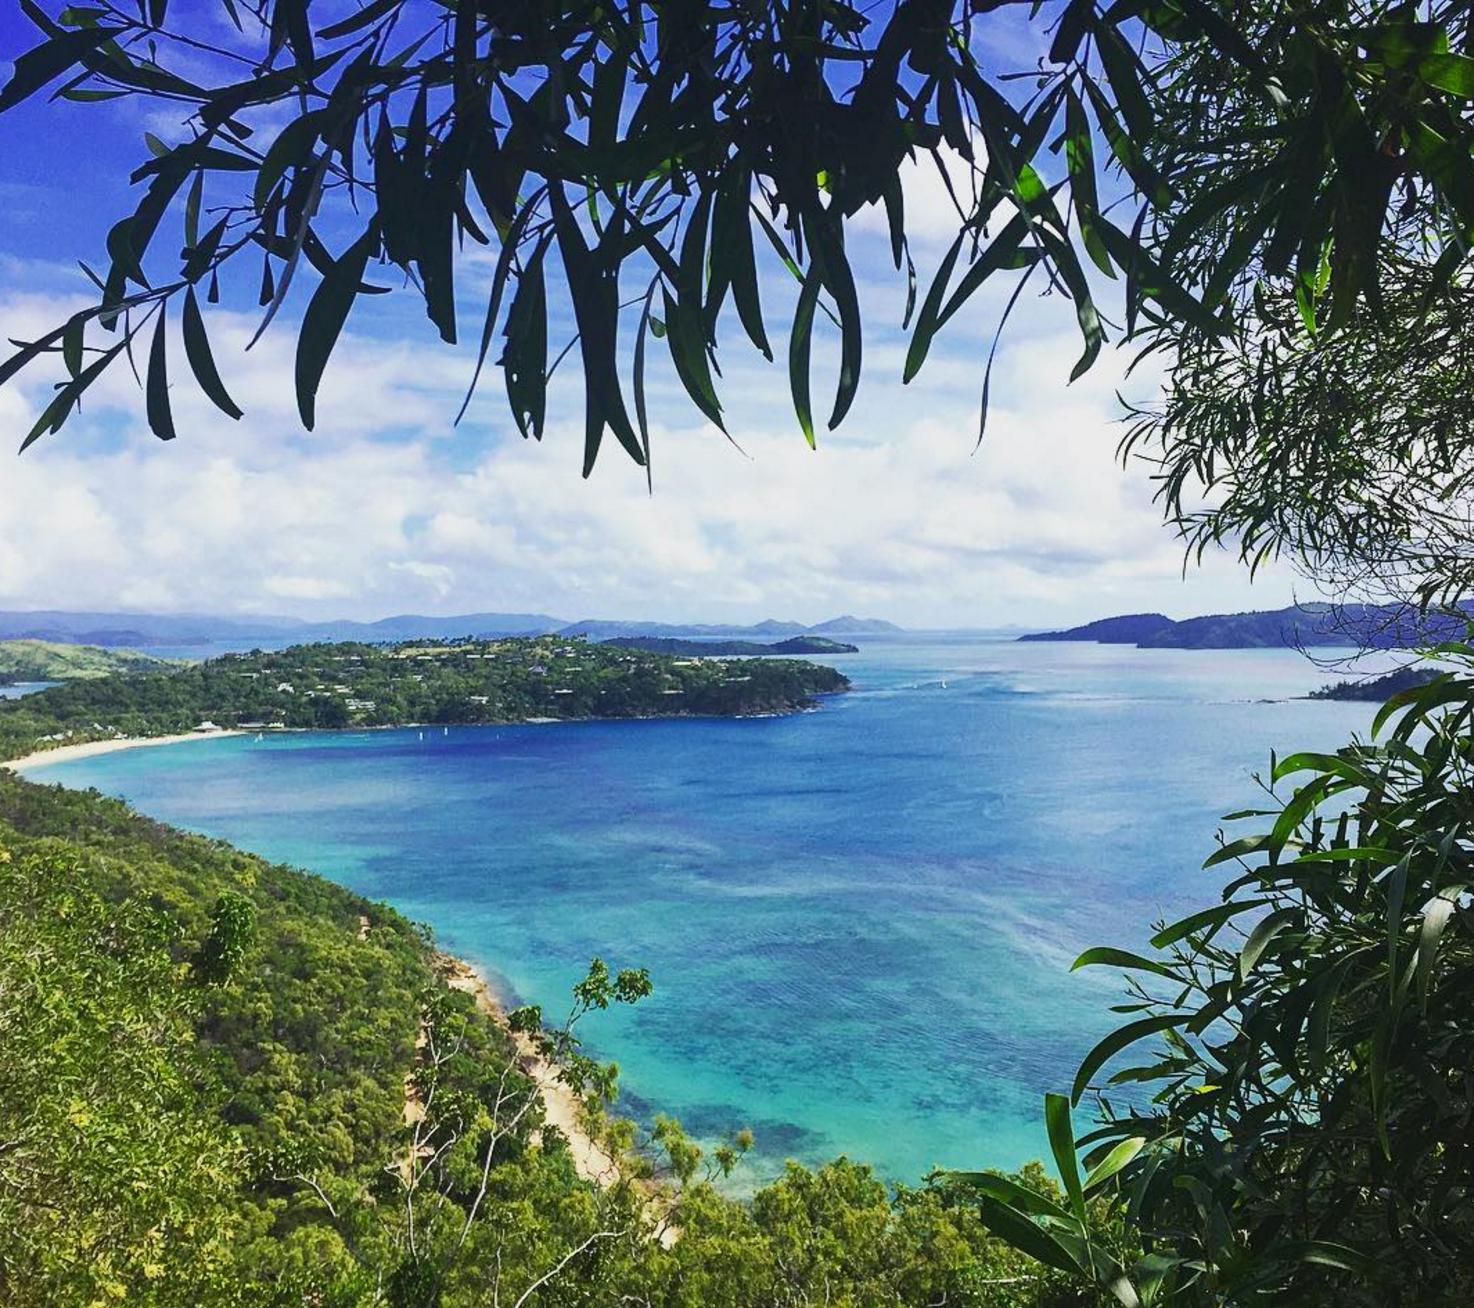 hamilton island lookout